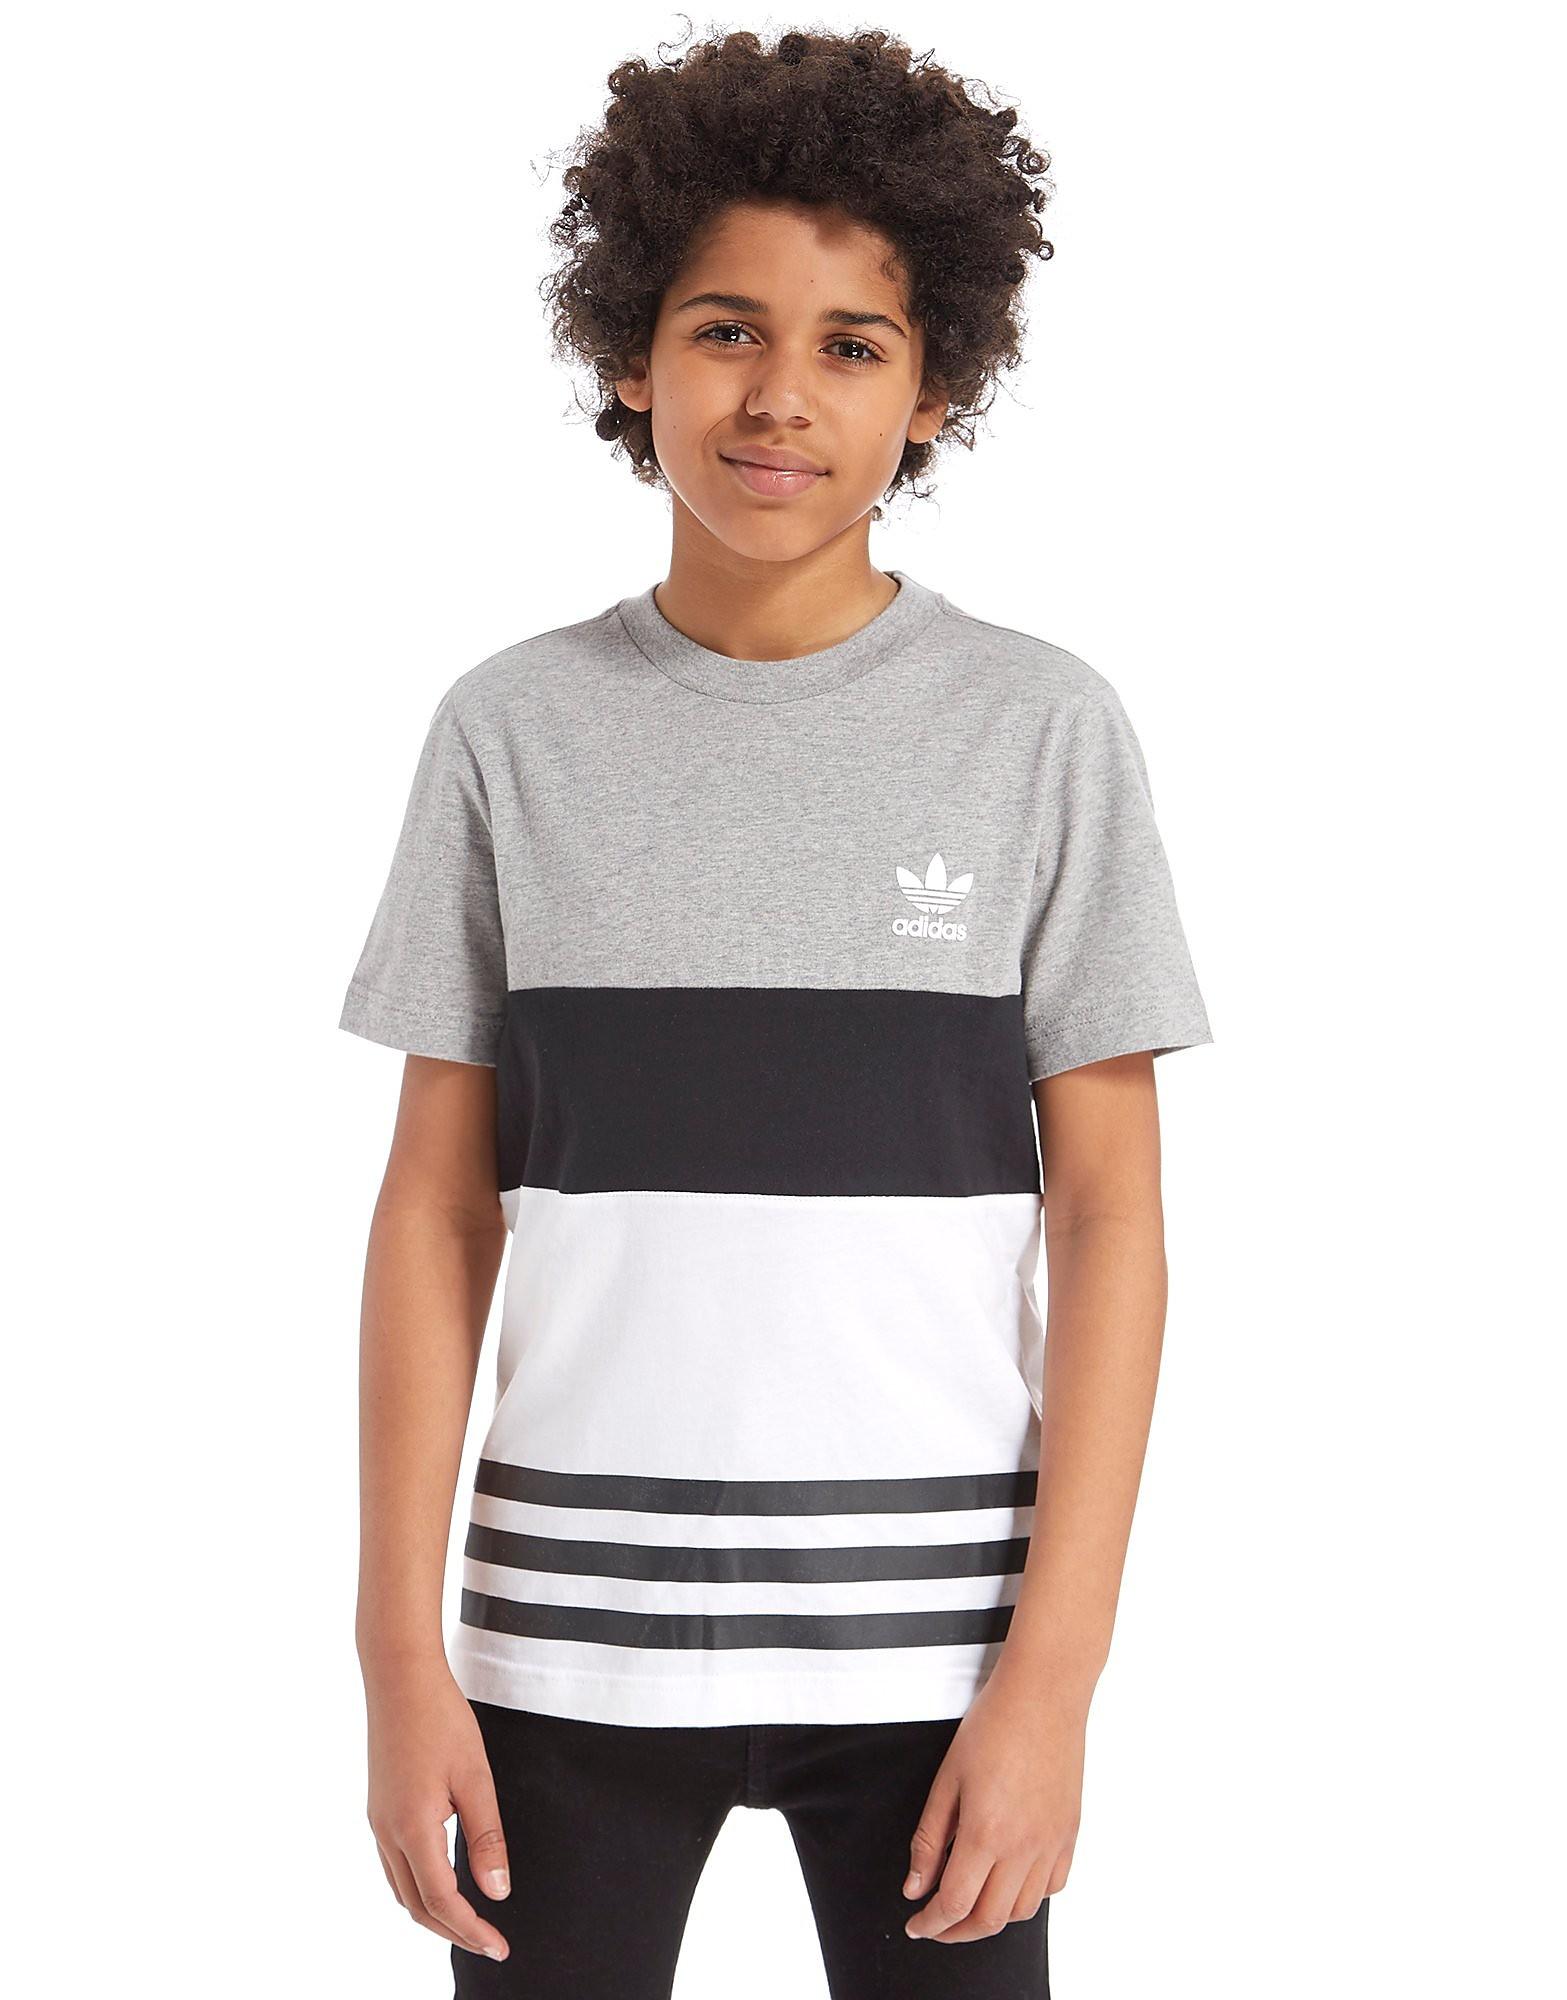 adidas Originals Colour Block T-Shirt Junior